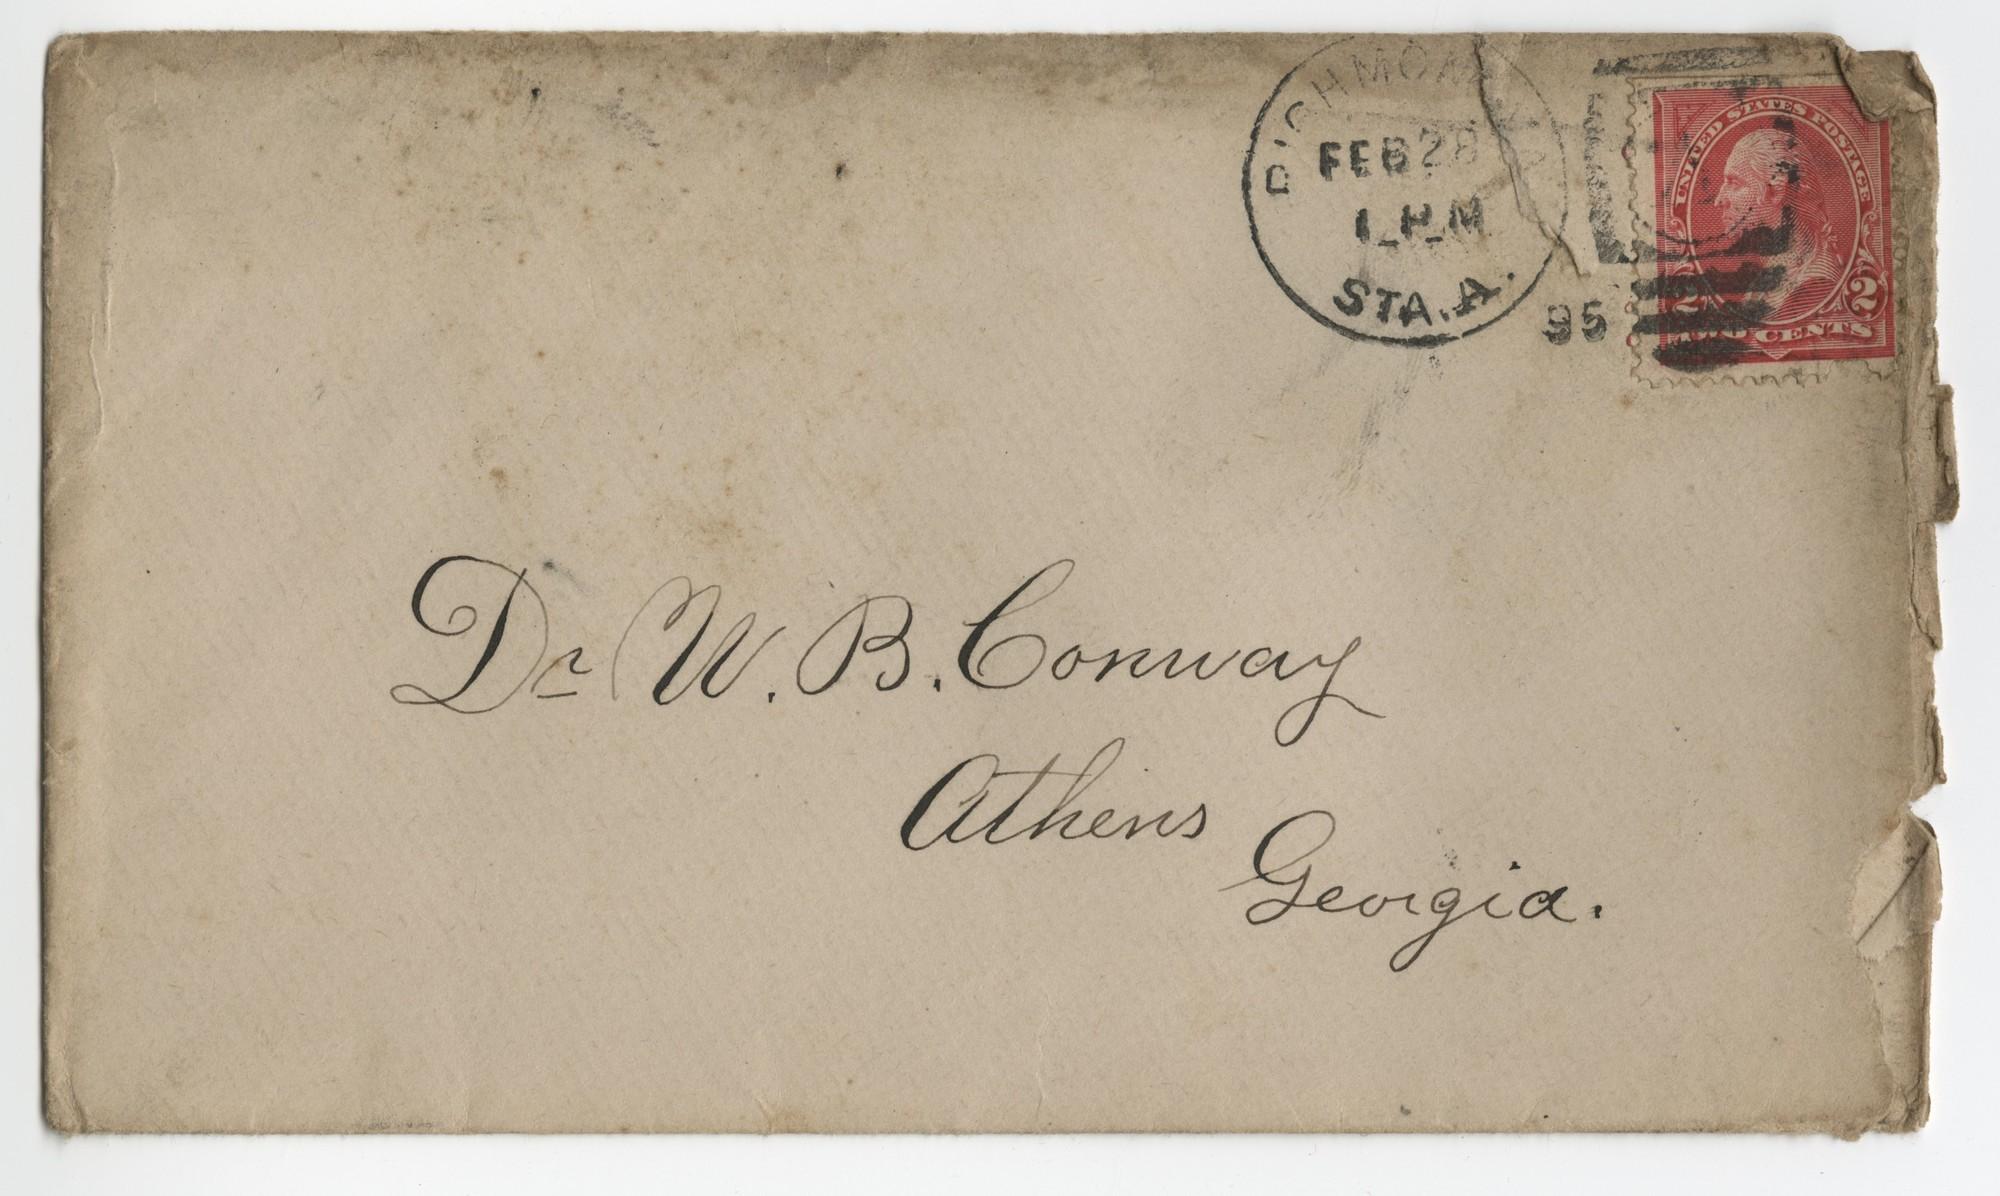 http://spec.lib.vt.edu/pickup/Omeka_upload/Ms2012-039_ConwayCatlett_F1_Letter_1895_0227_enva.jpg